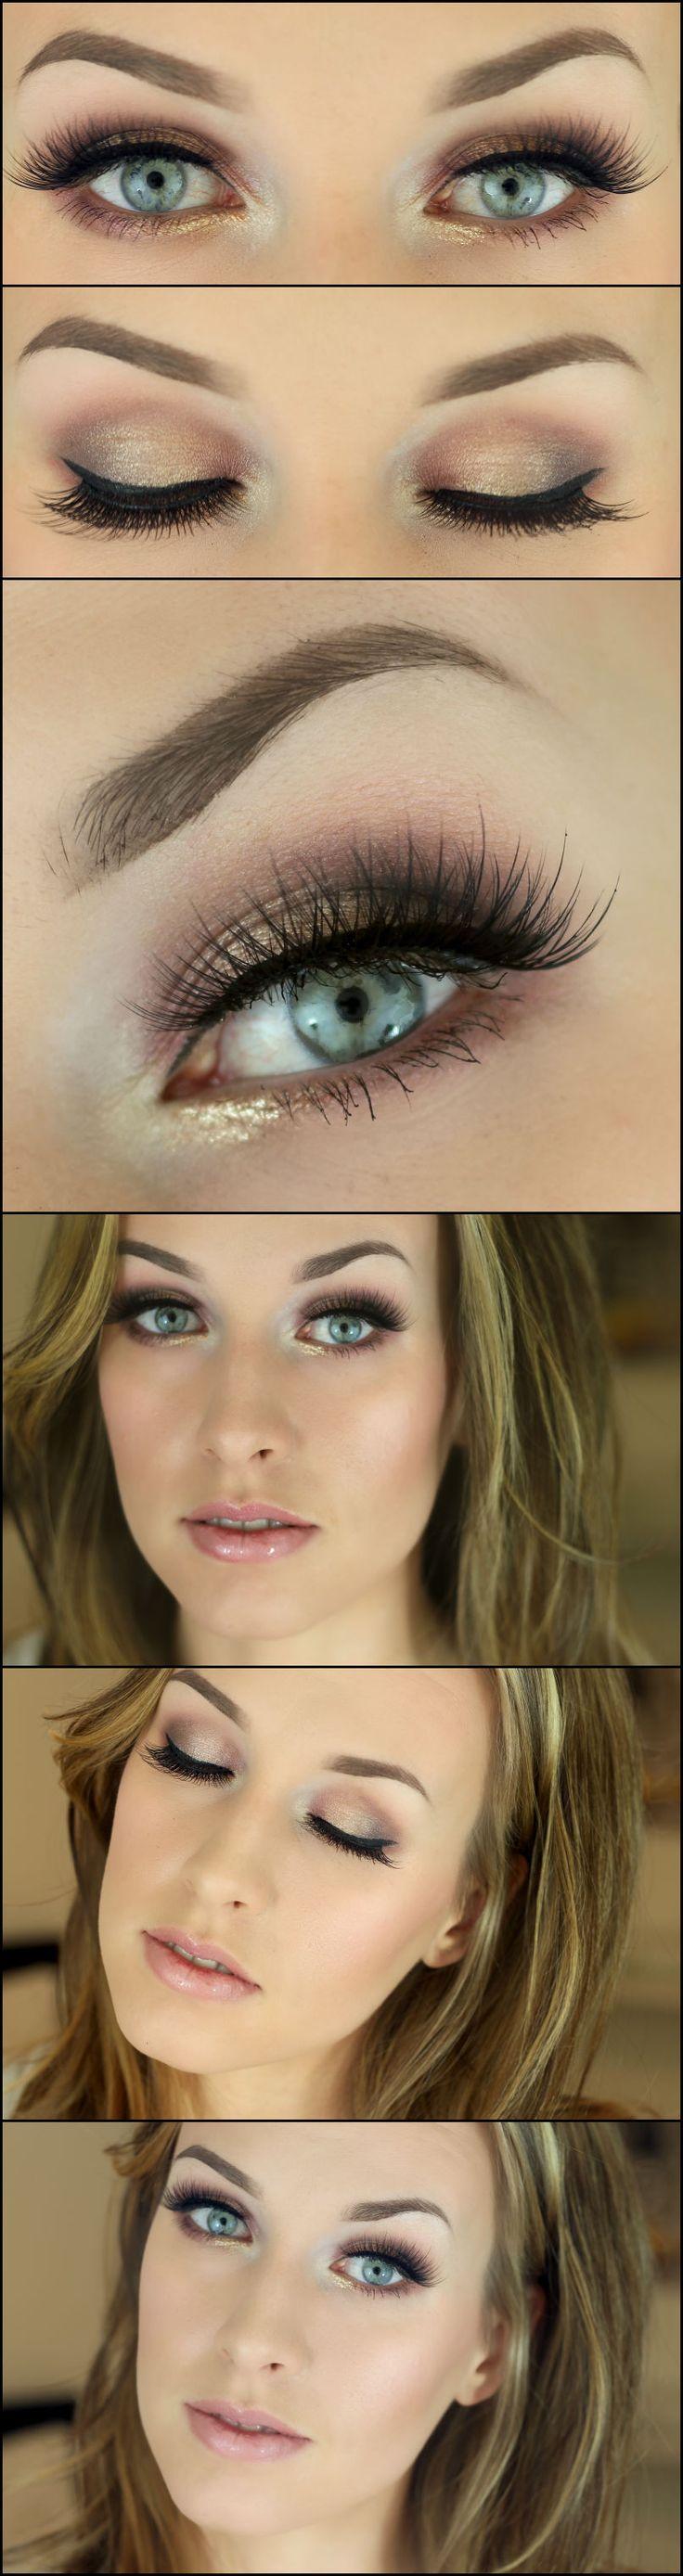 Sam Patterson x samjpat x Valentines Day Eye Makeup #naked3 #urbandecay #naked3palette